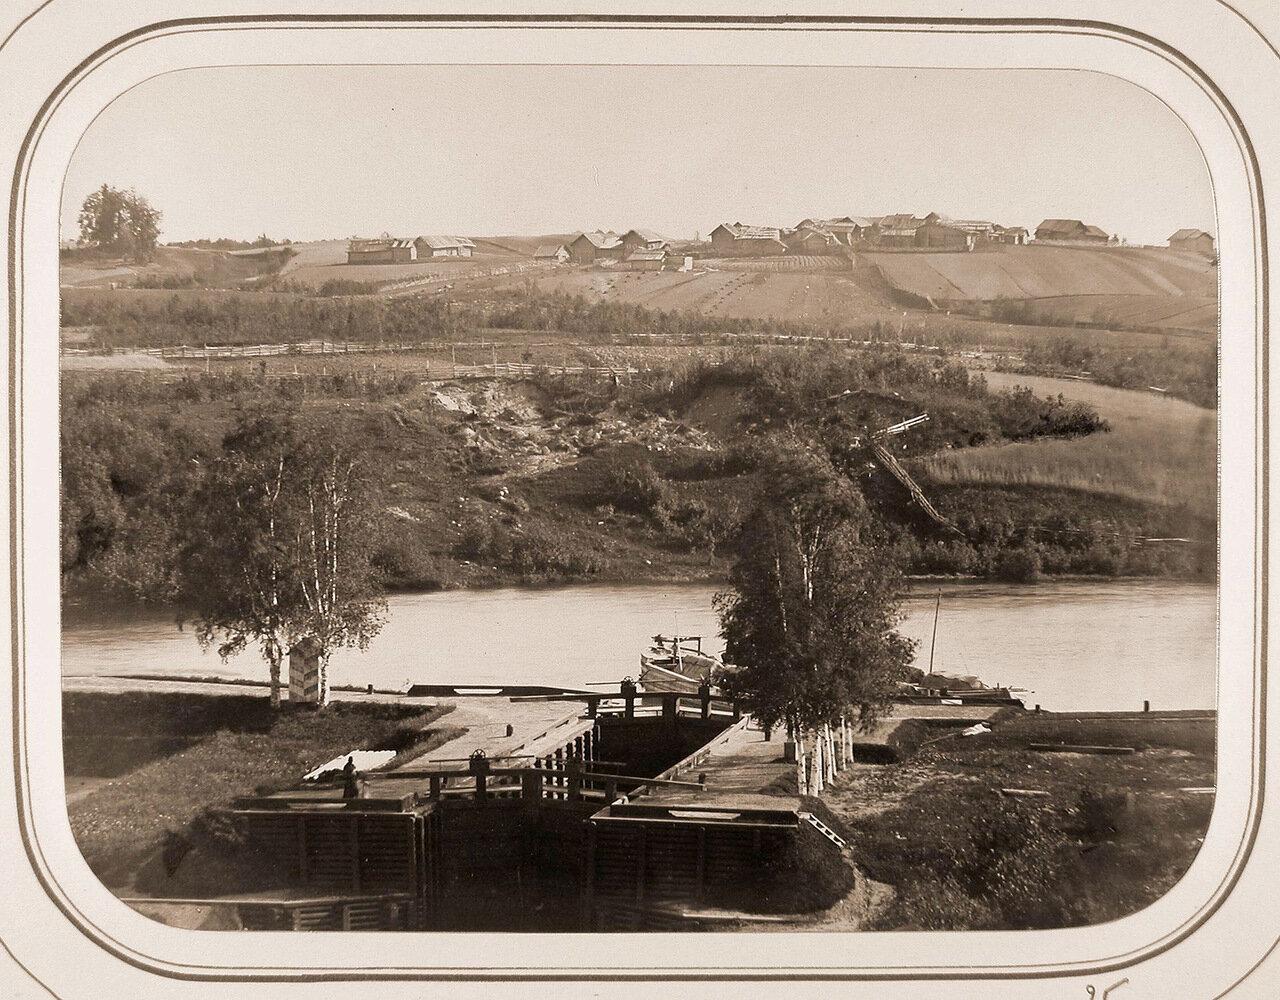 Вид на Рязанский шлюз; на втором плане - деревня Горки